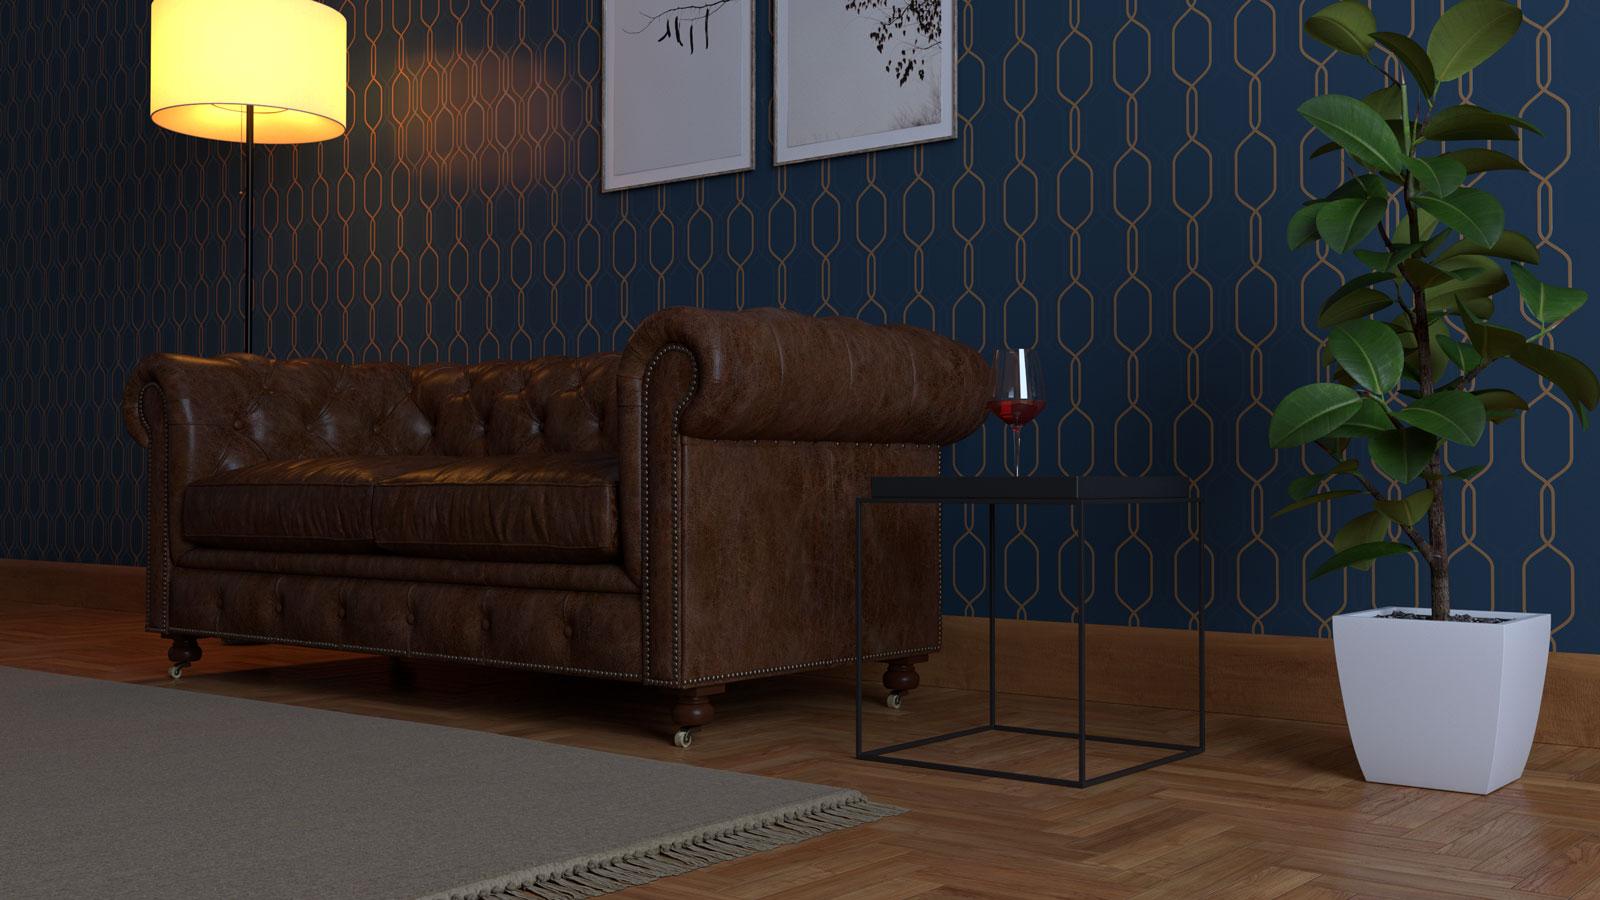 Sketchup living room scene - Bitopia 3D rendering studio